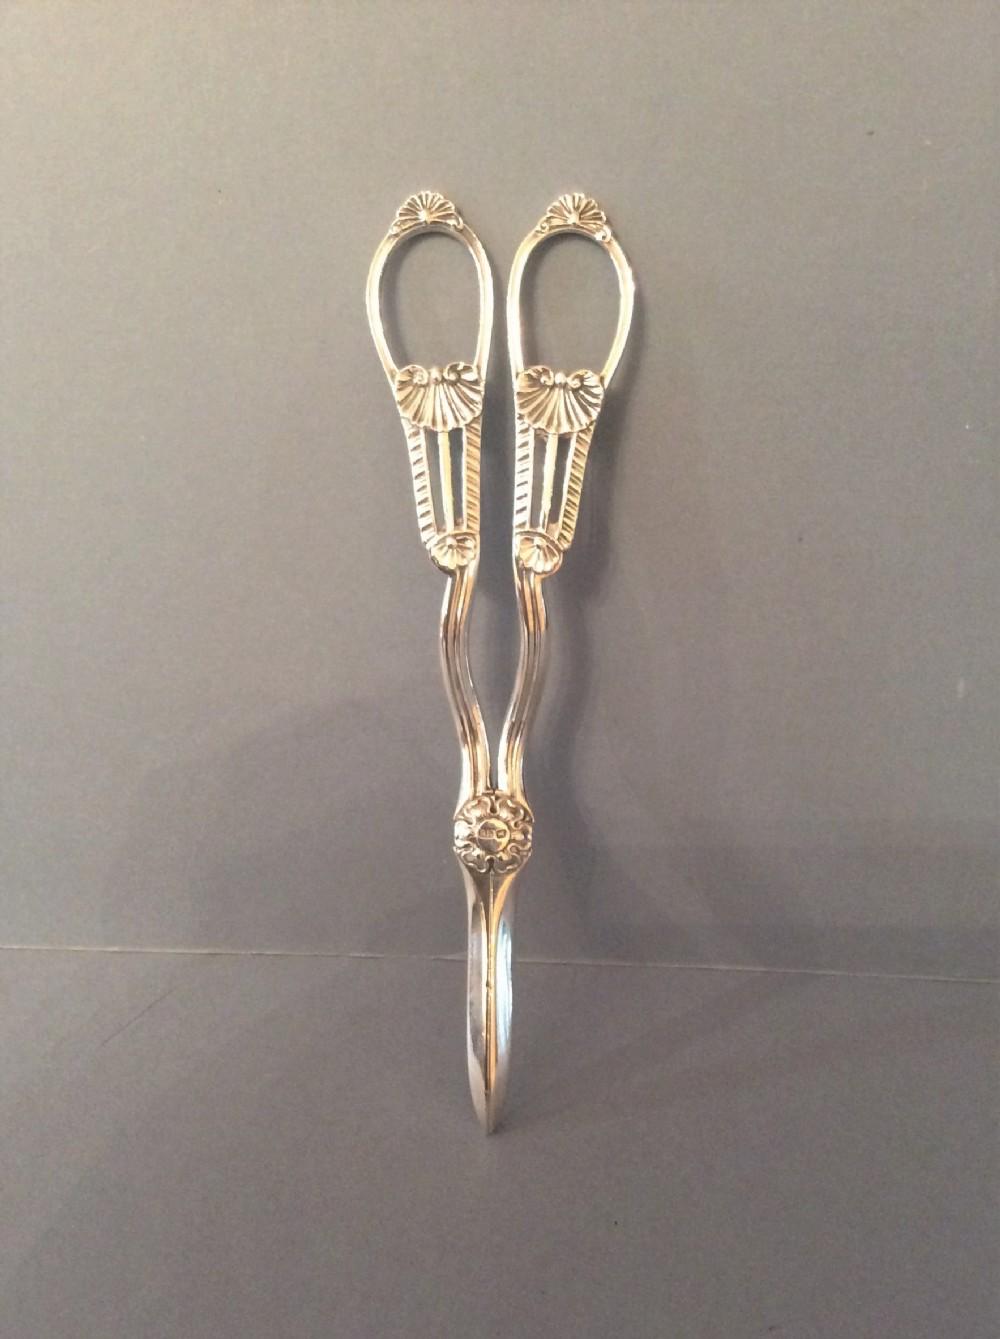 pair of antique victorian solid silver grape scissors